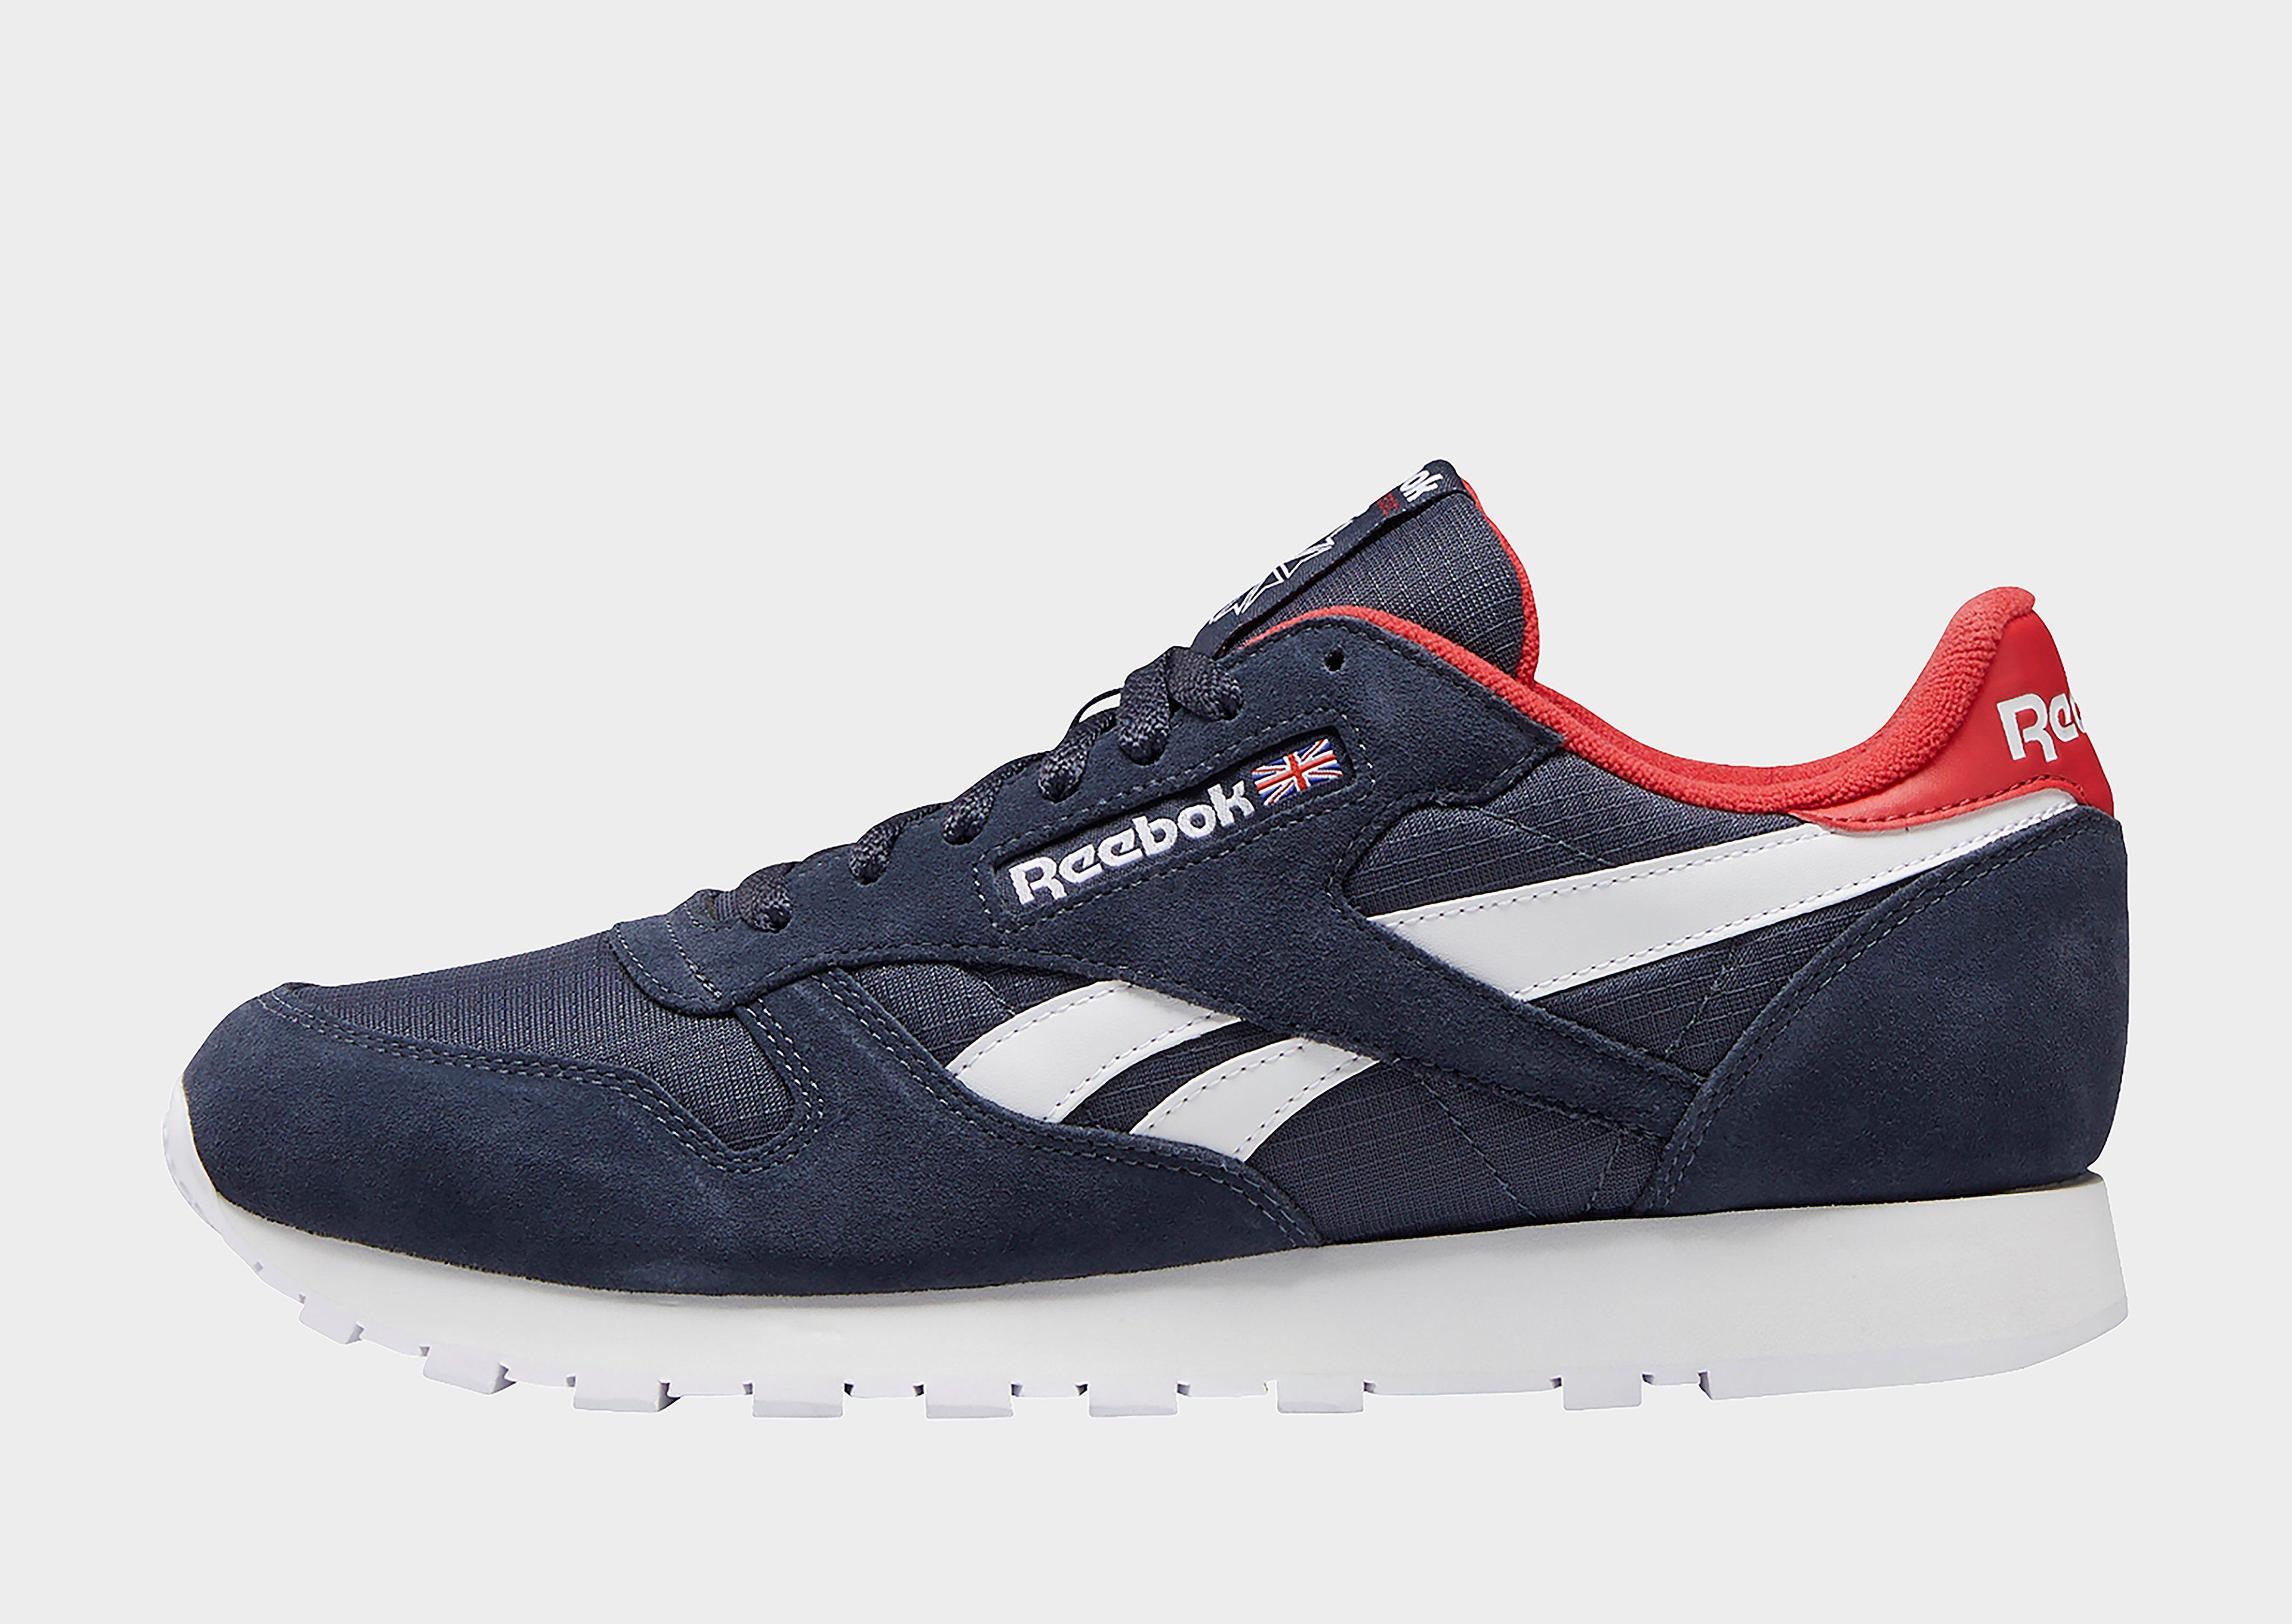 c5f1389ff37 REEBOK Classic Leather Shoes | JD Sports